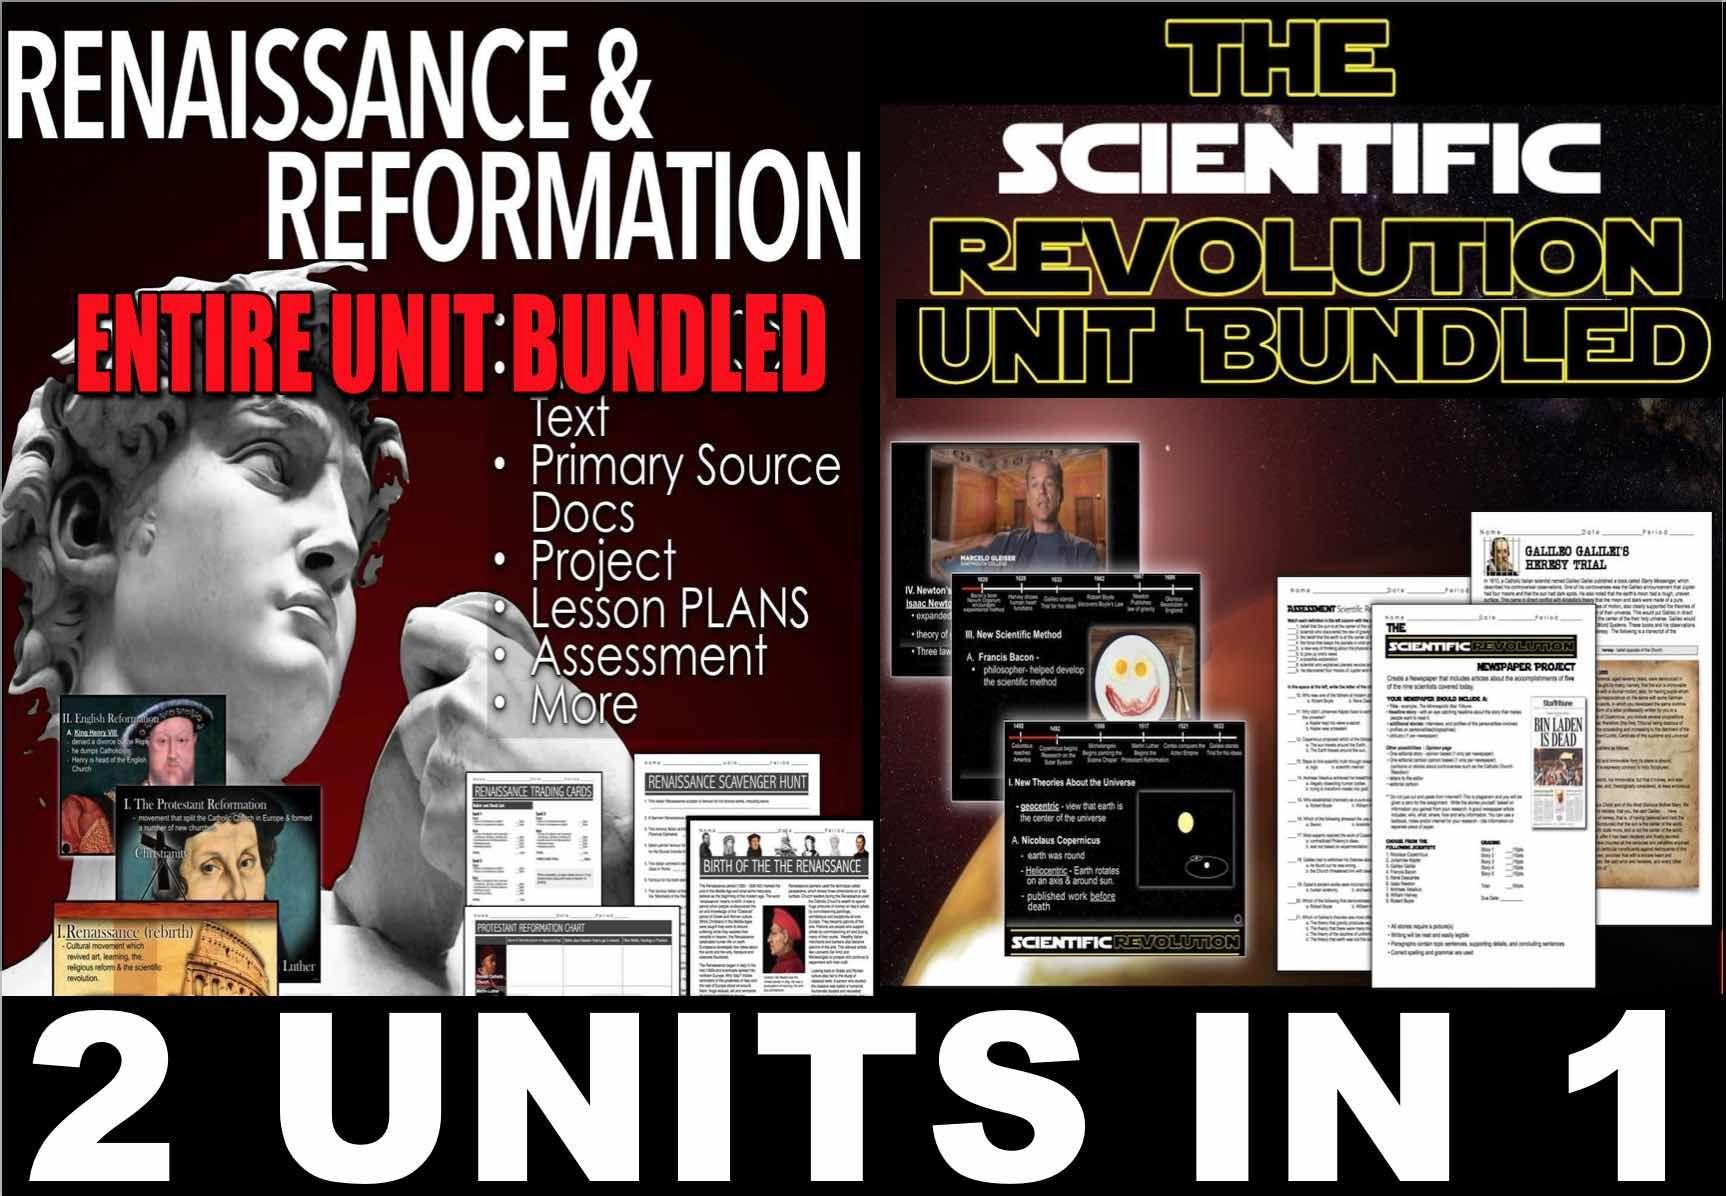 worksheet The Scientific Revolution Worksheet renaissancescientific revolution unit bundled 2 units in 1 1